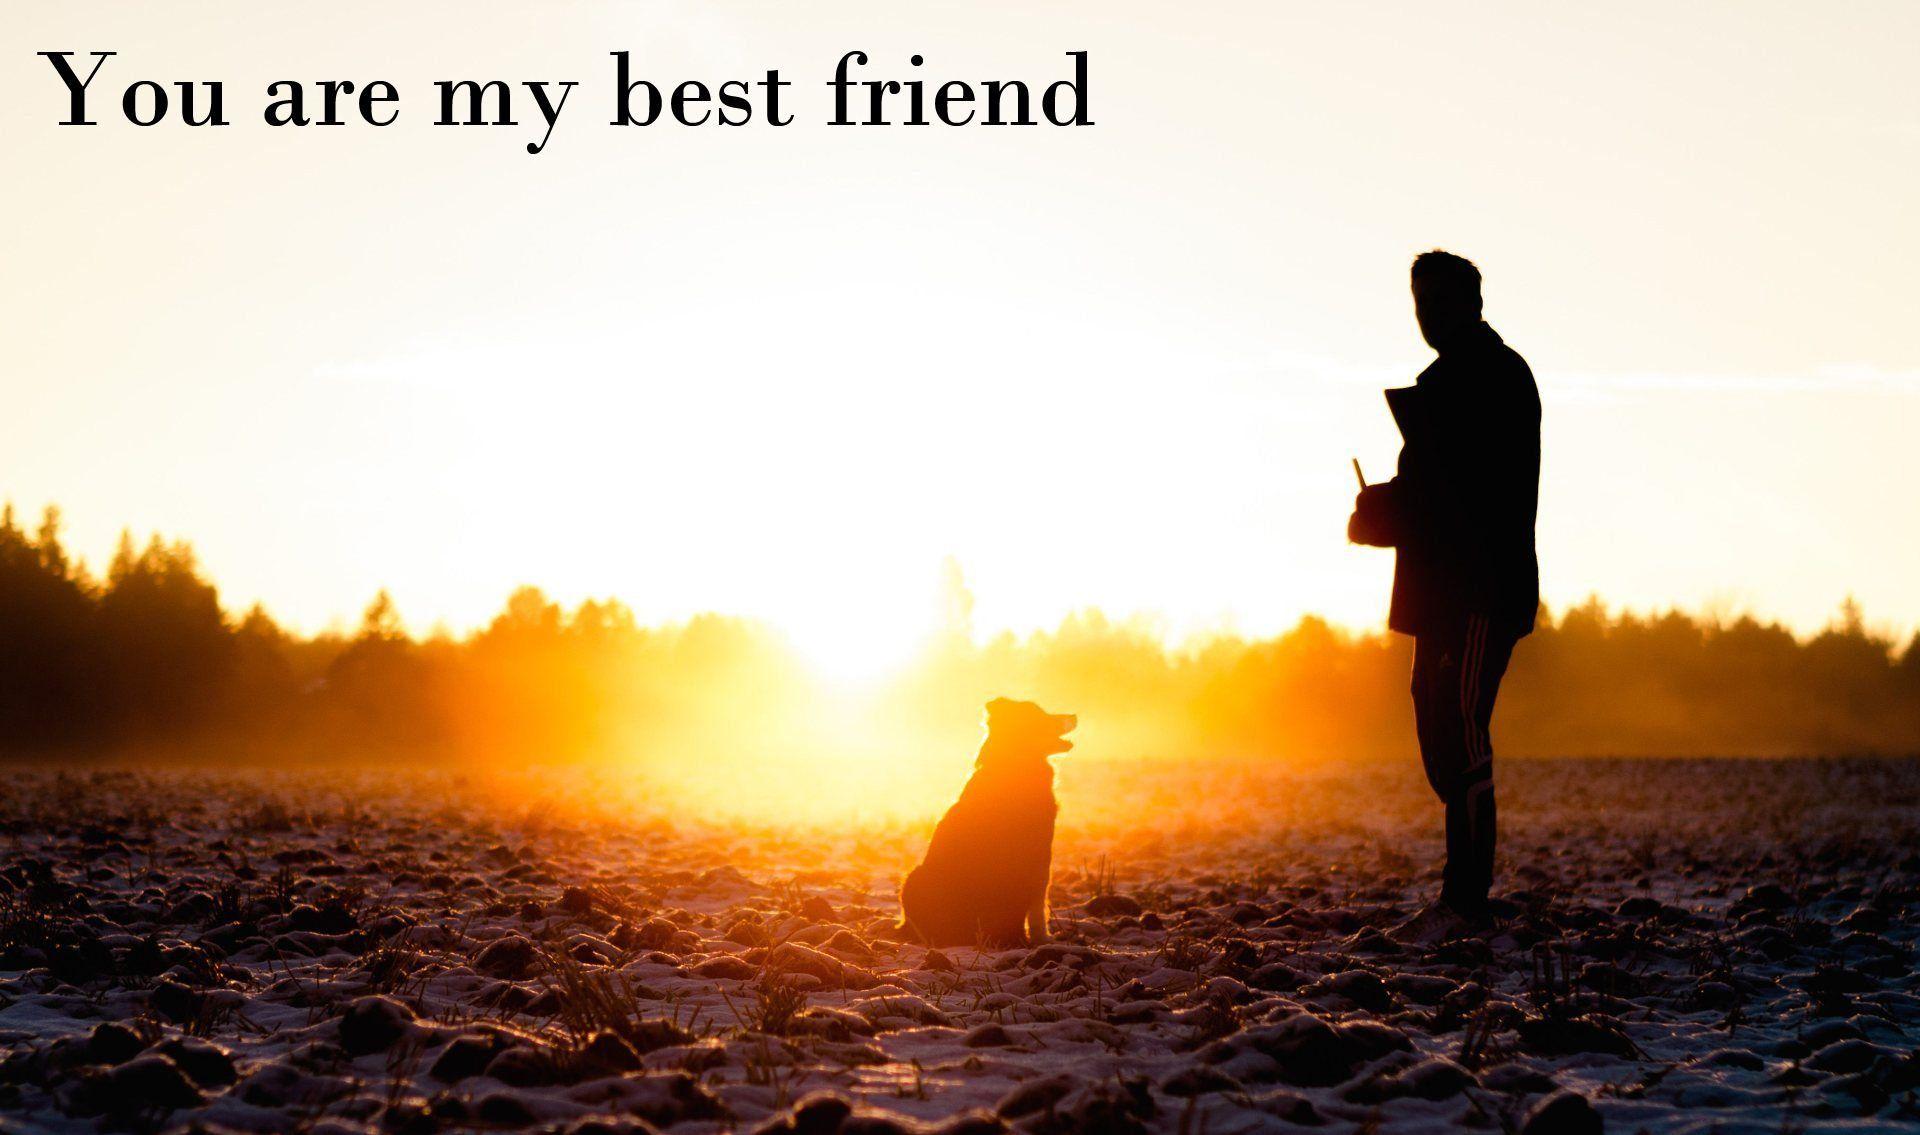 Best Friend Backgrounds 1920x1135